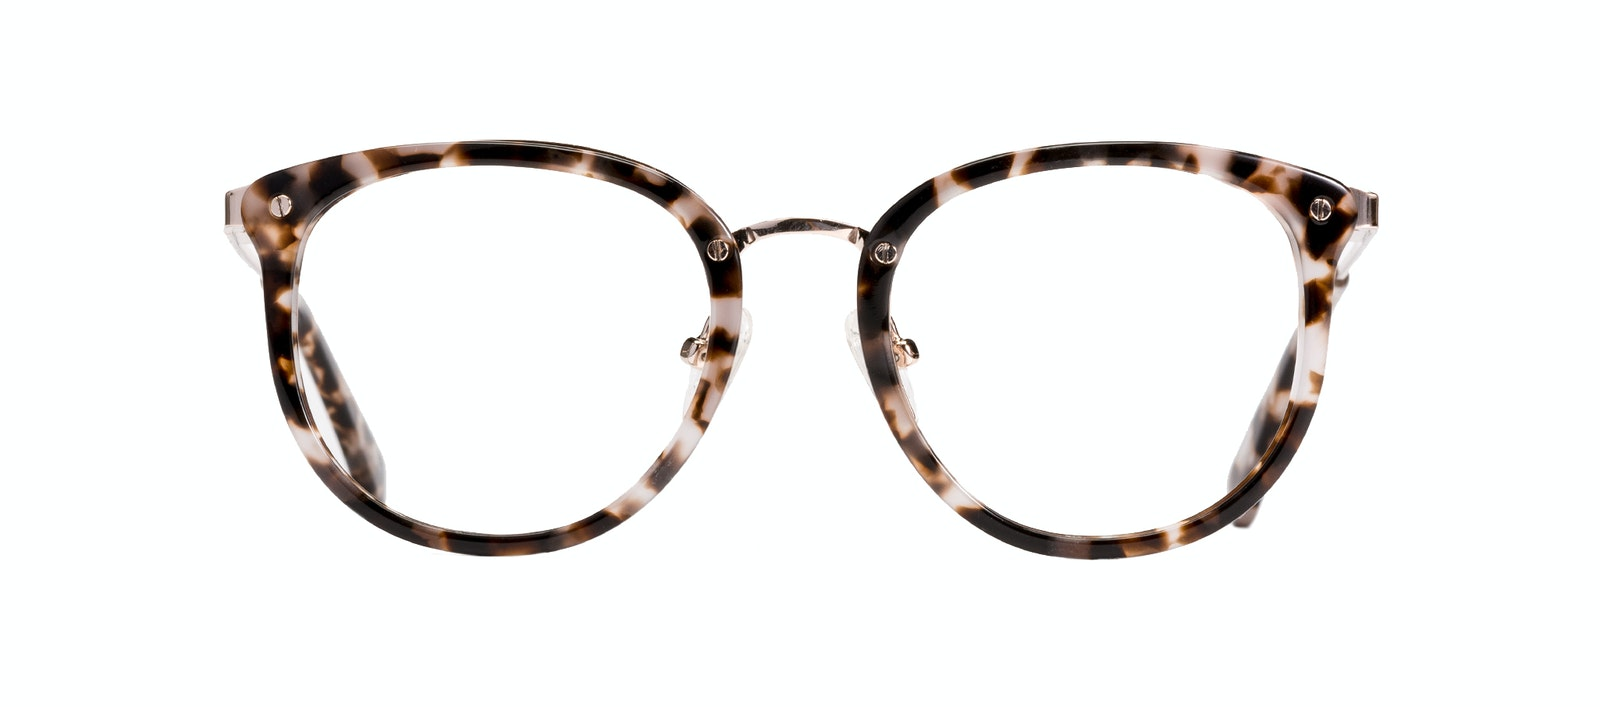 d7e5bd5bcf5 Affordable Fashion Glasses Round Eyeglasses Women Amaze Petite Mocha Tort  Front